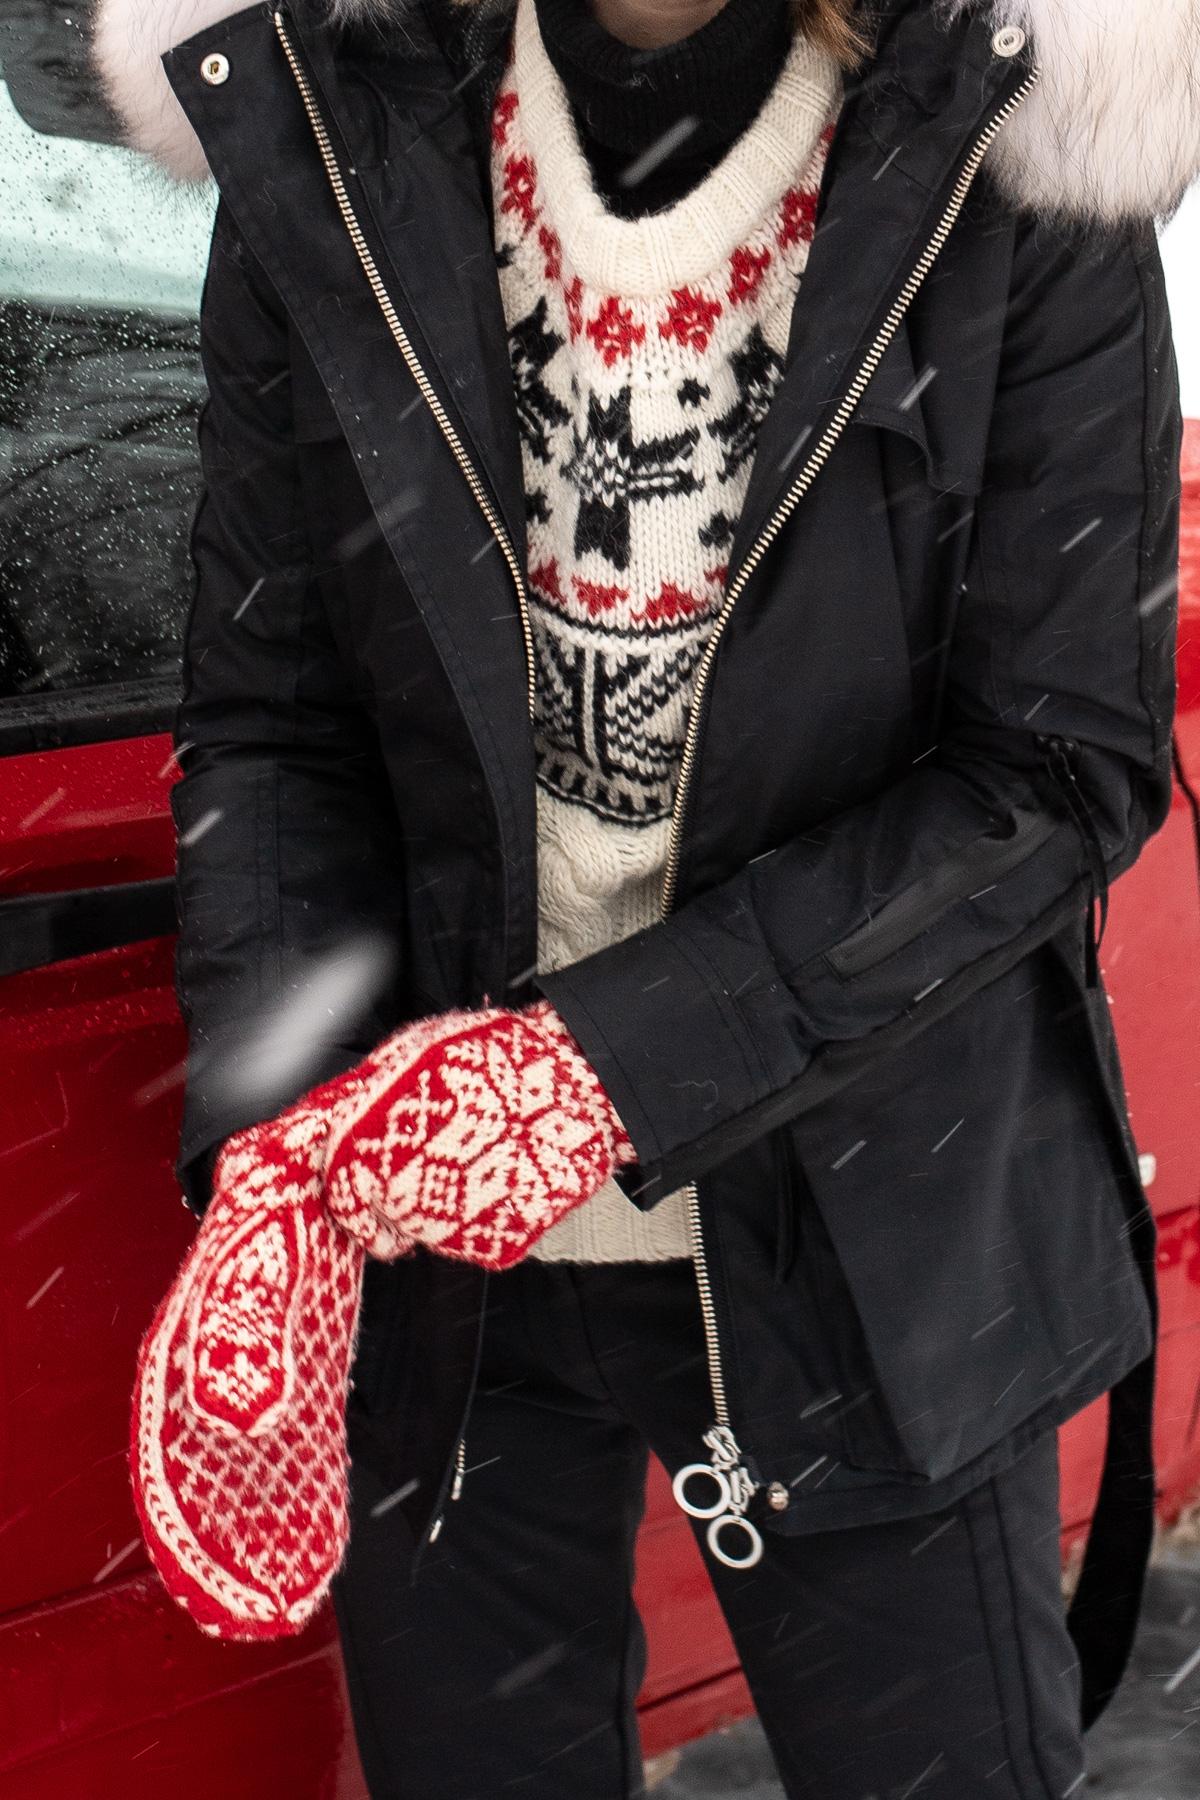 Stacie Flinner x Winter Essentials Troy London Jacket-21.jpg